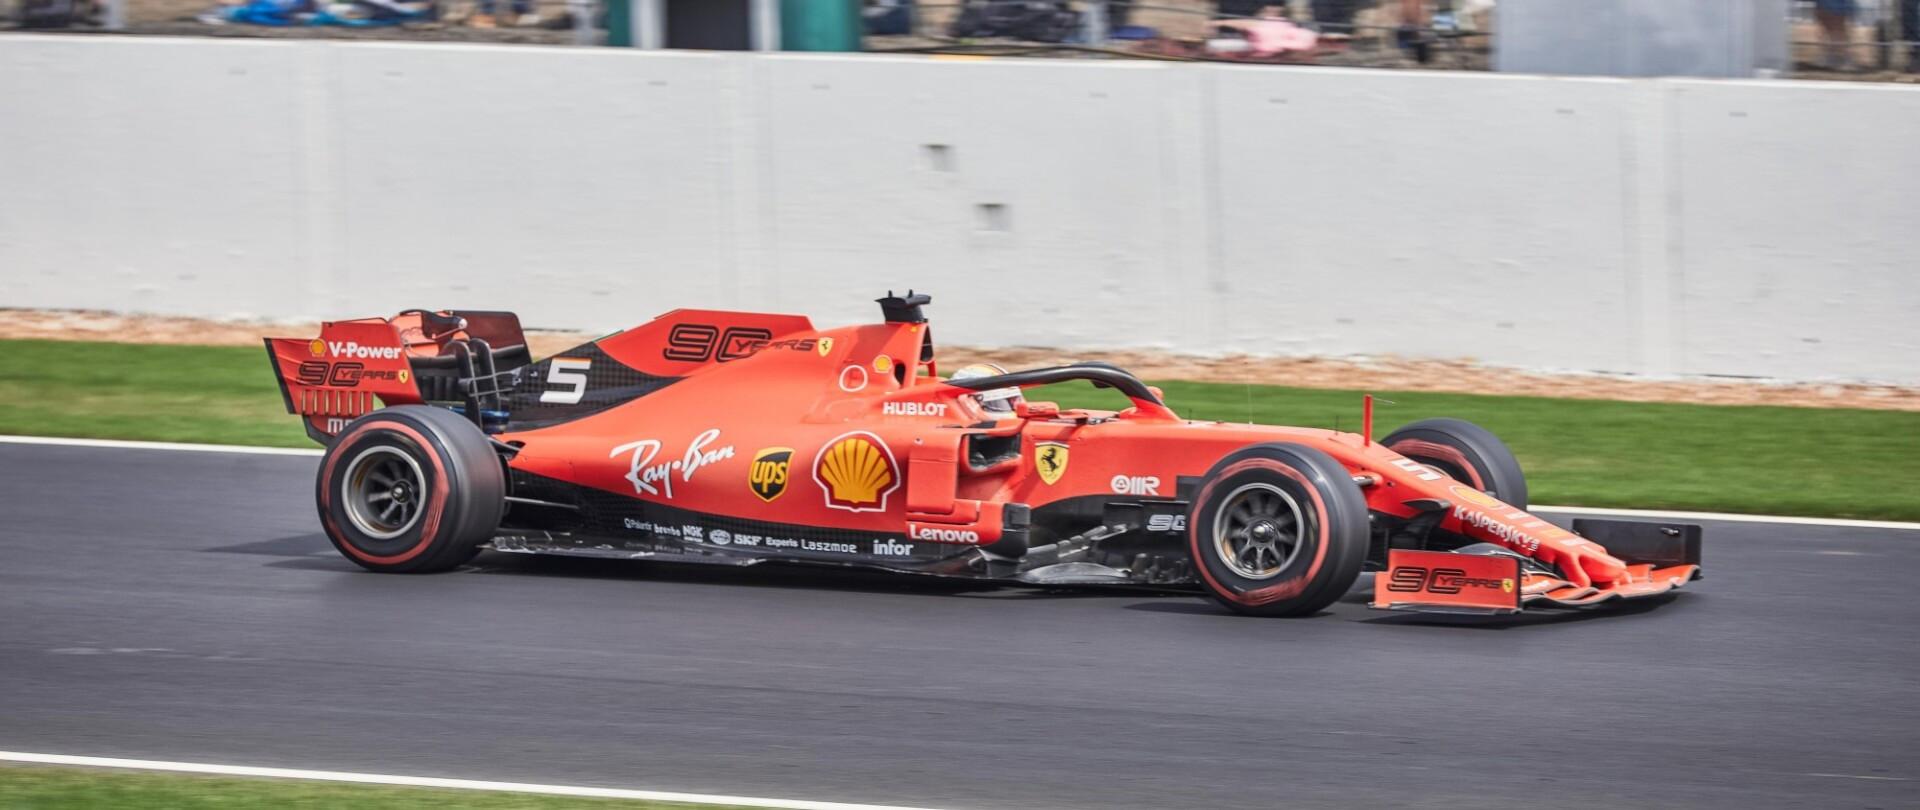 Experience the Formula 1 British Grand Prix like never before photo 1